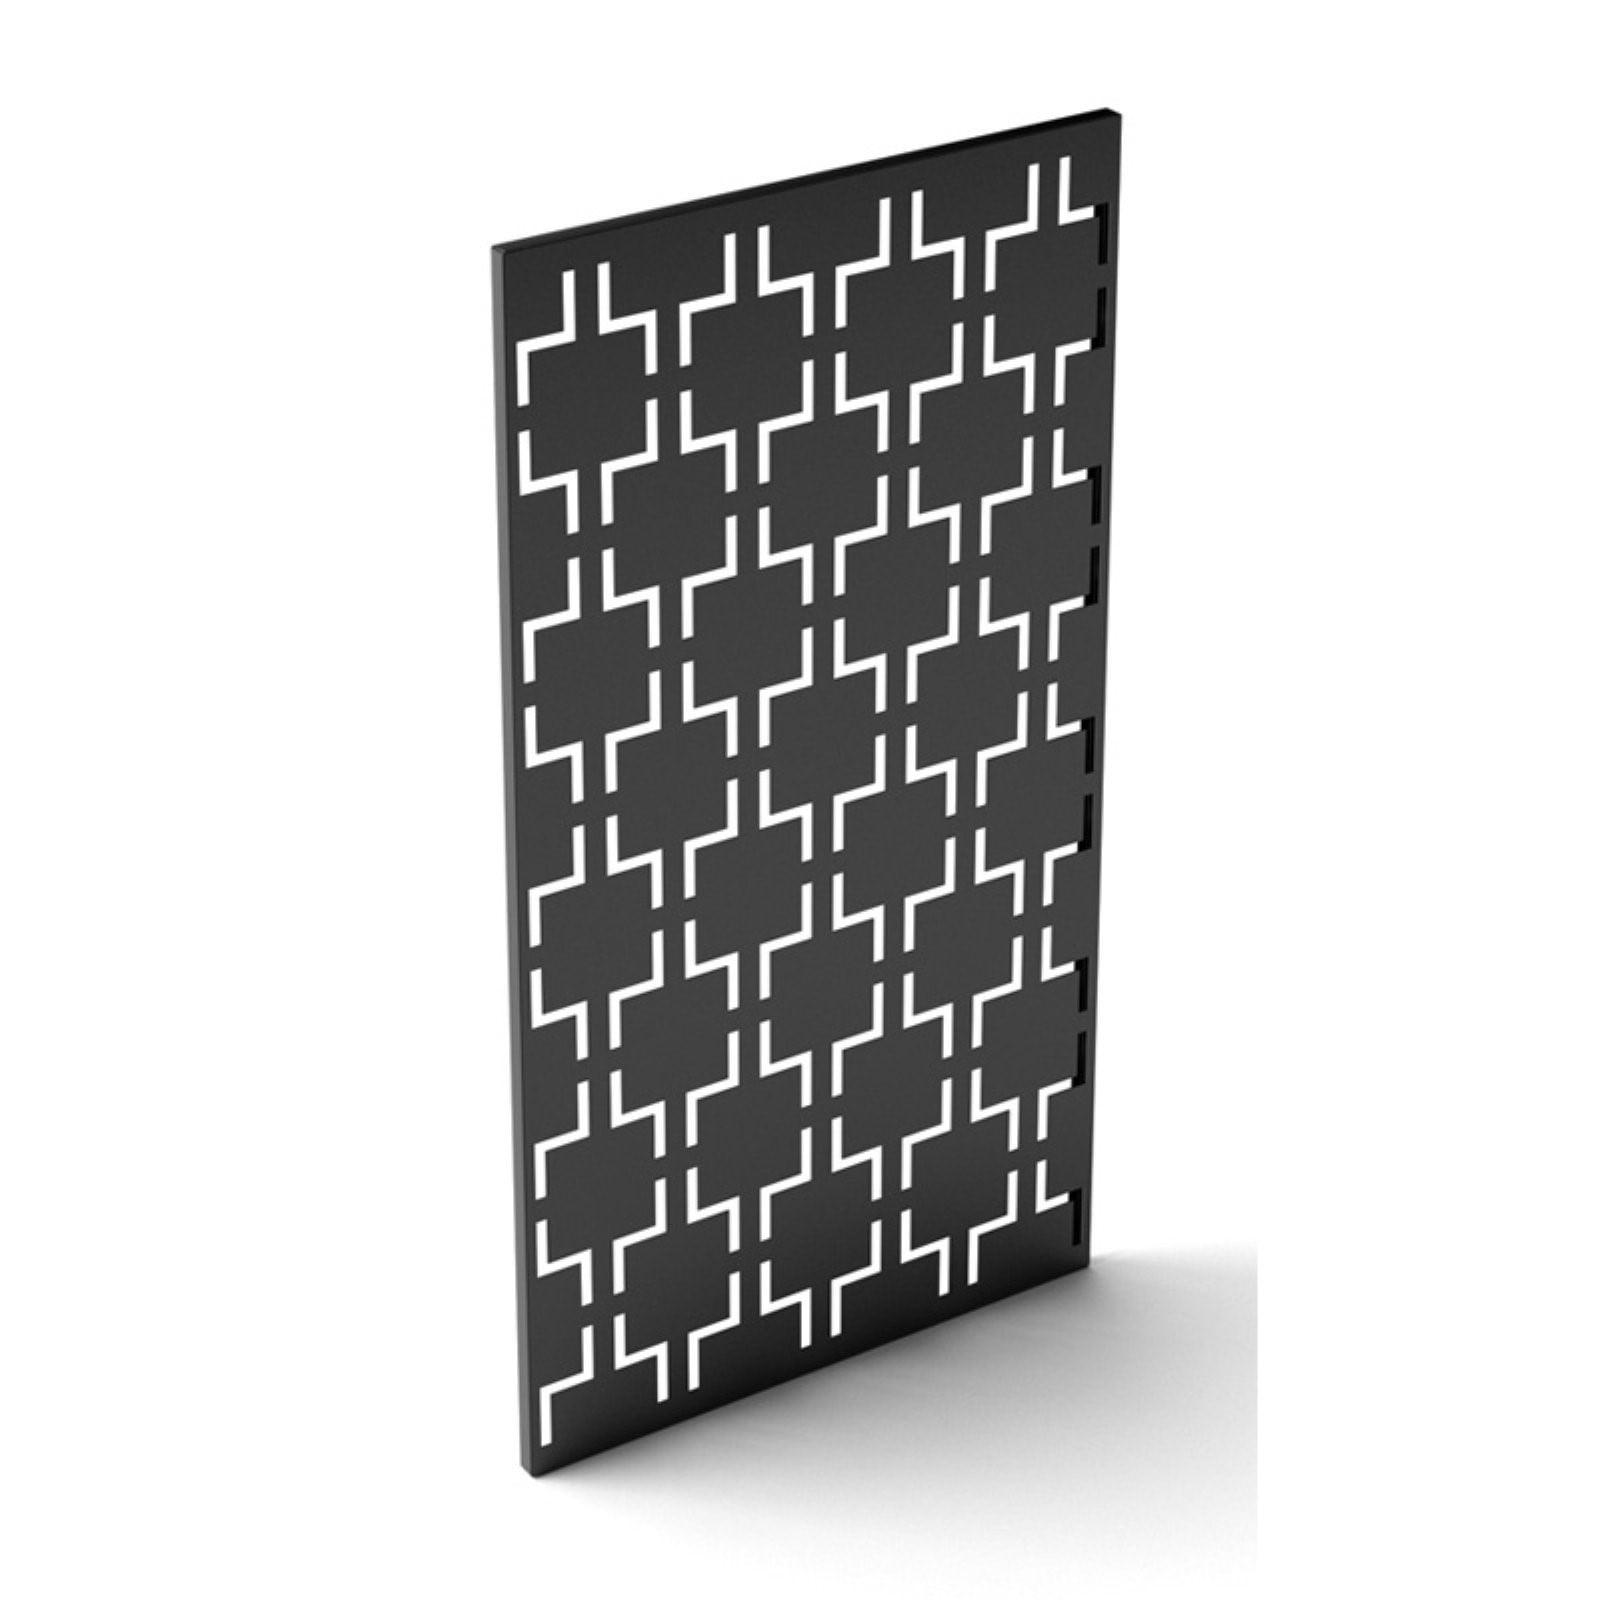 Veradek Quadra Outdoor Decorative Privacy Screen Panel